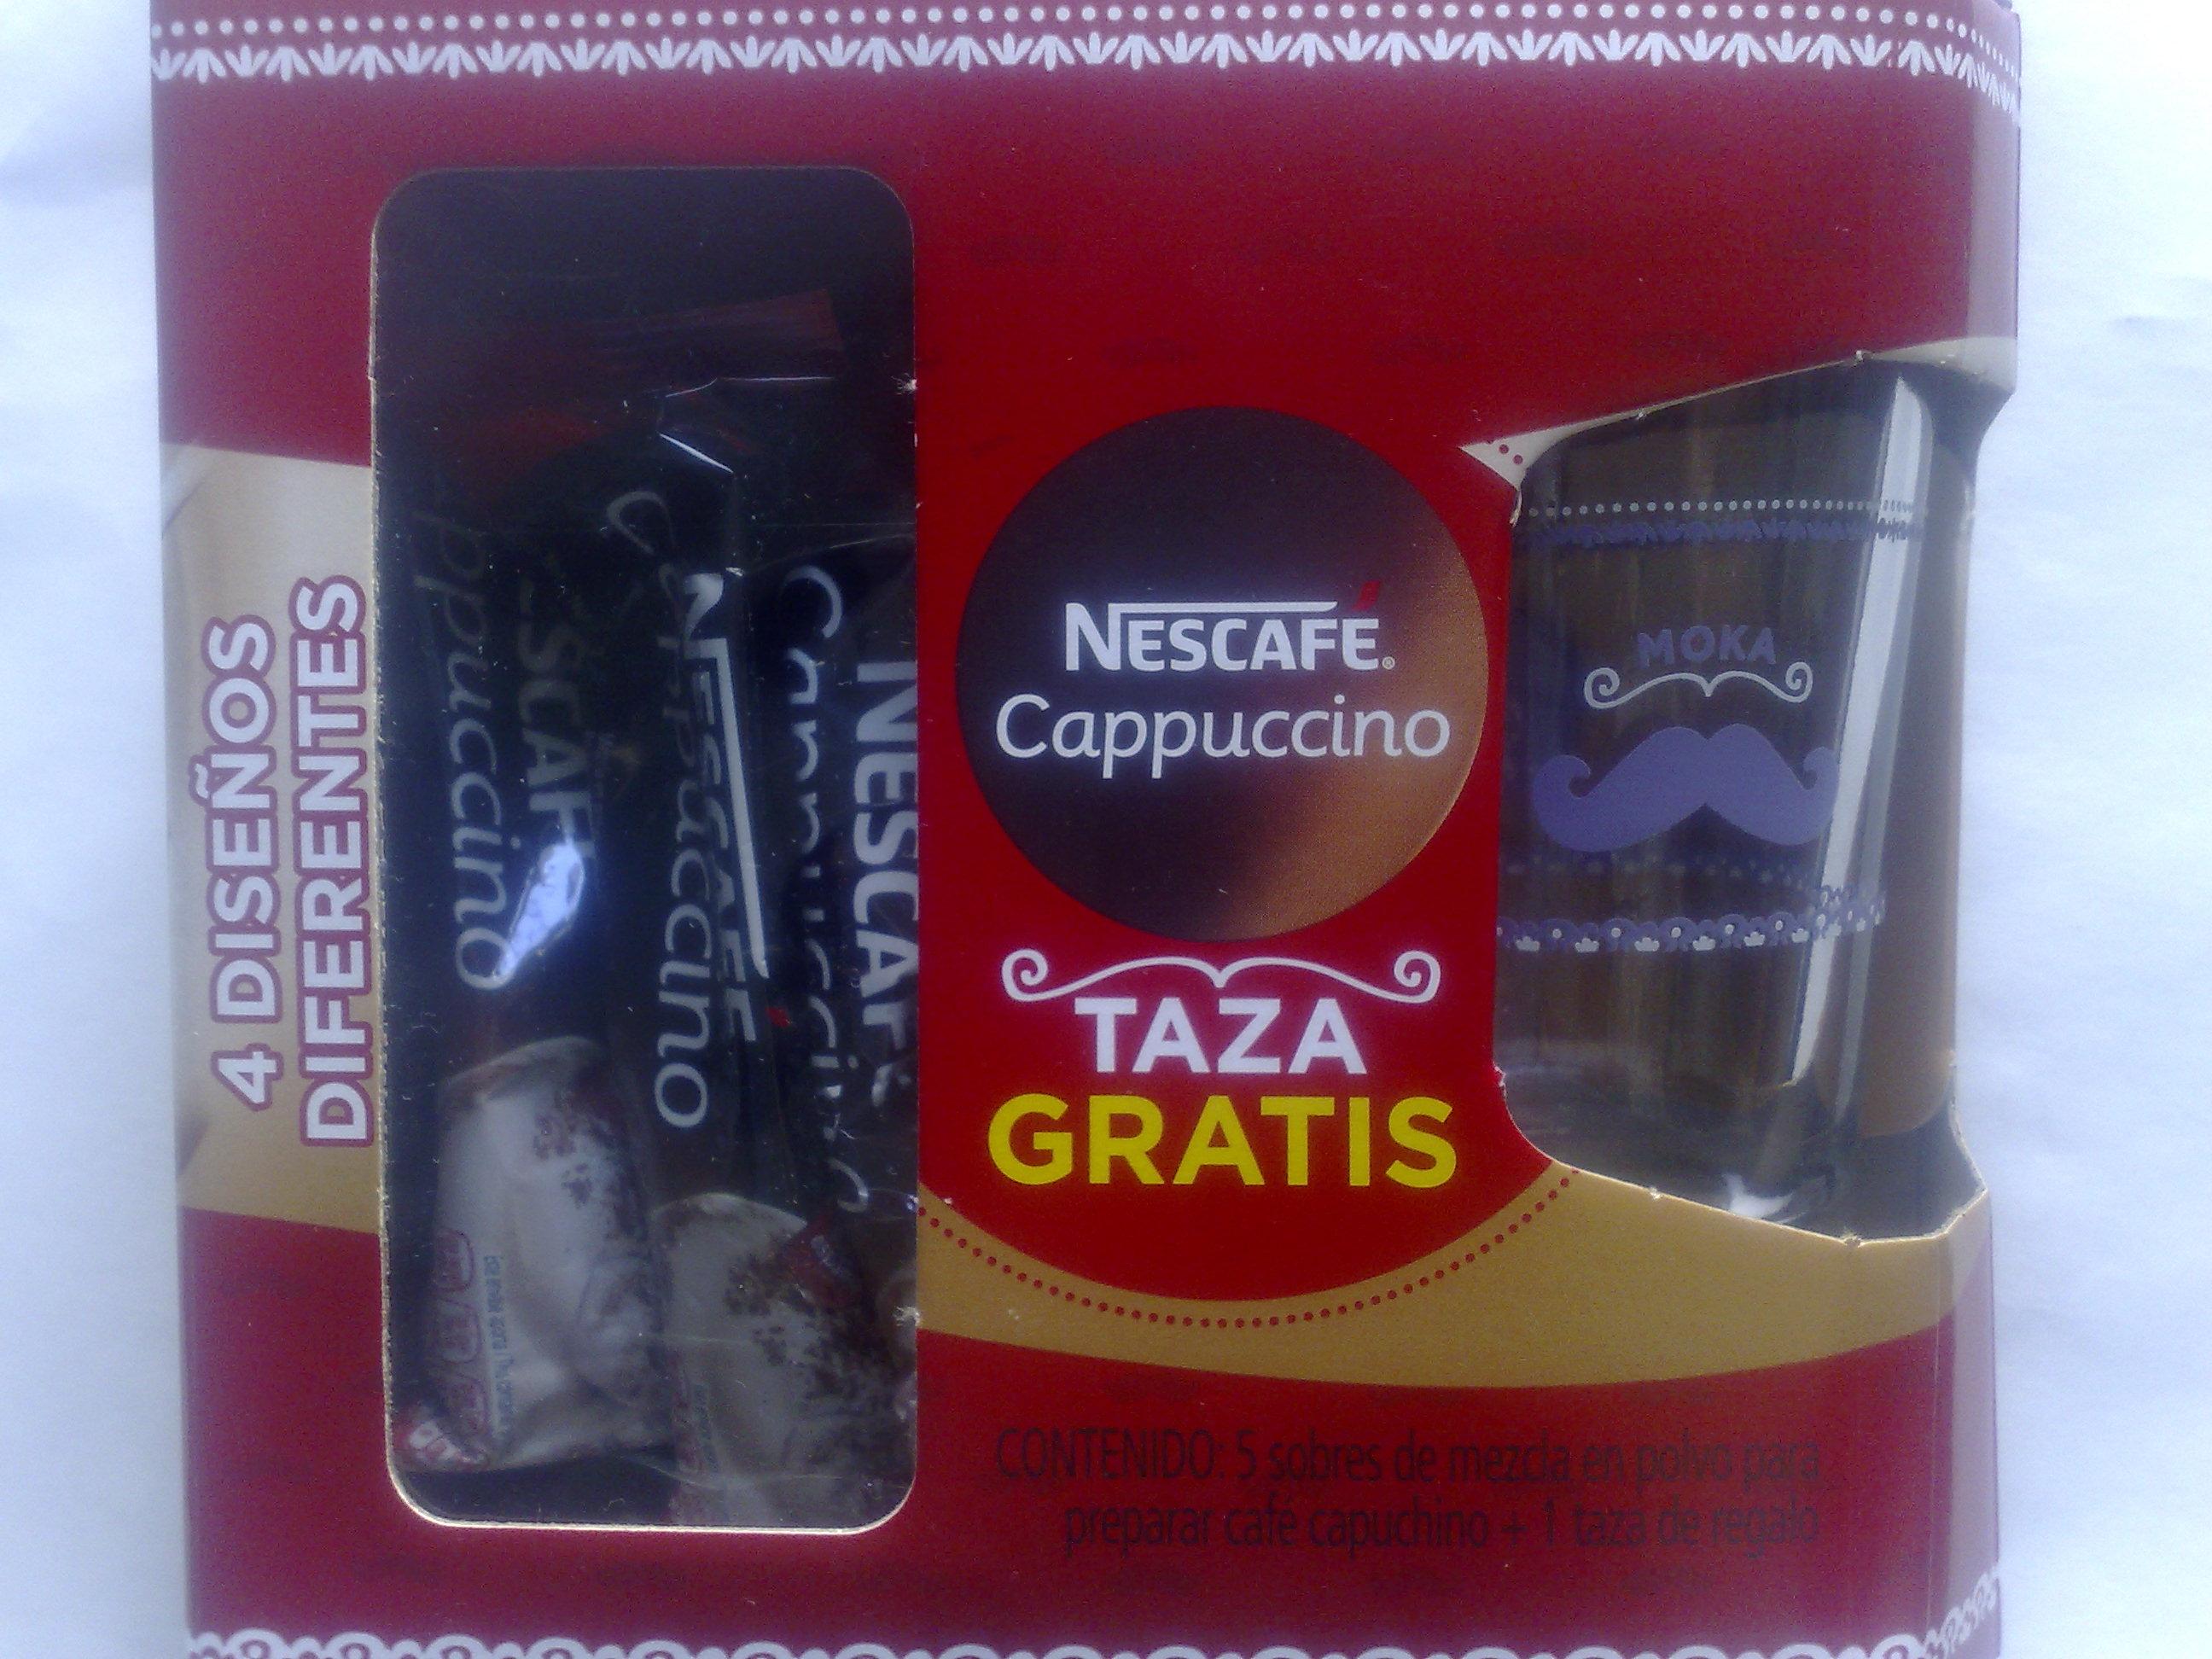 Bodega Aurrerá: 5 sobres nescafe cappuchino + taza